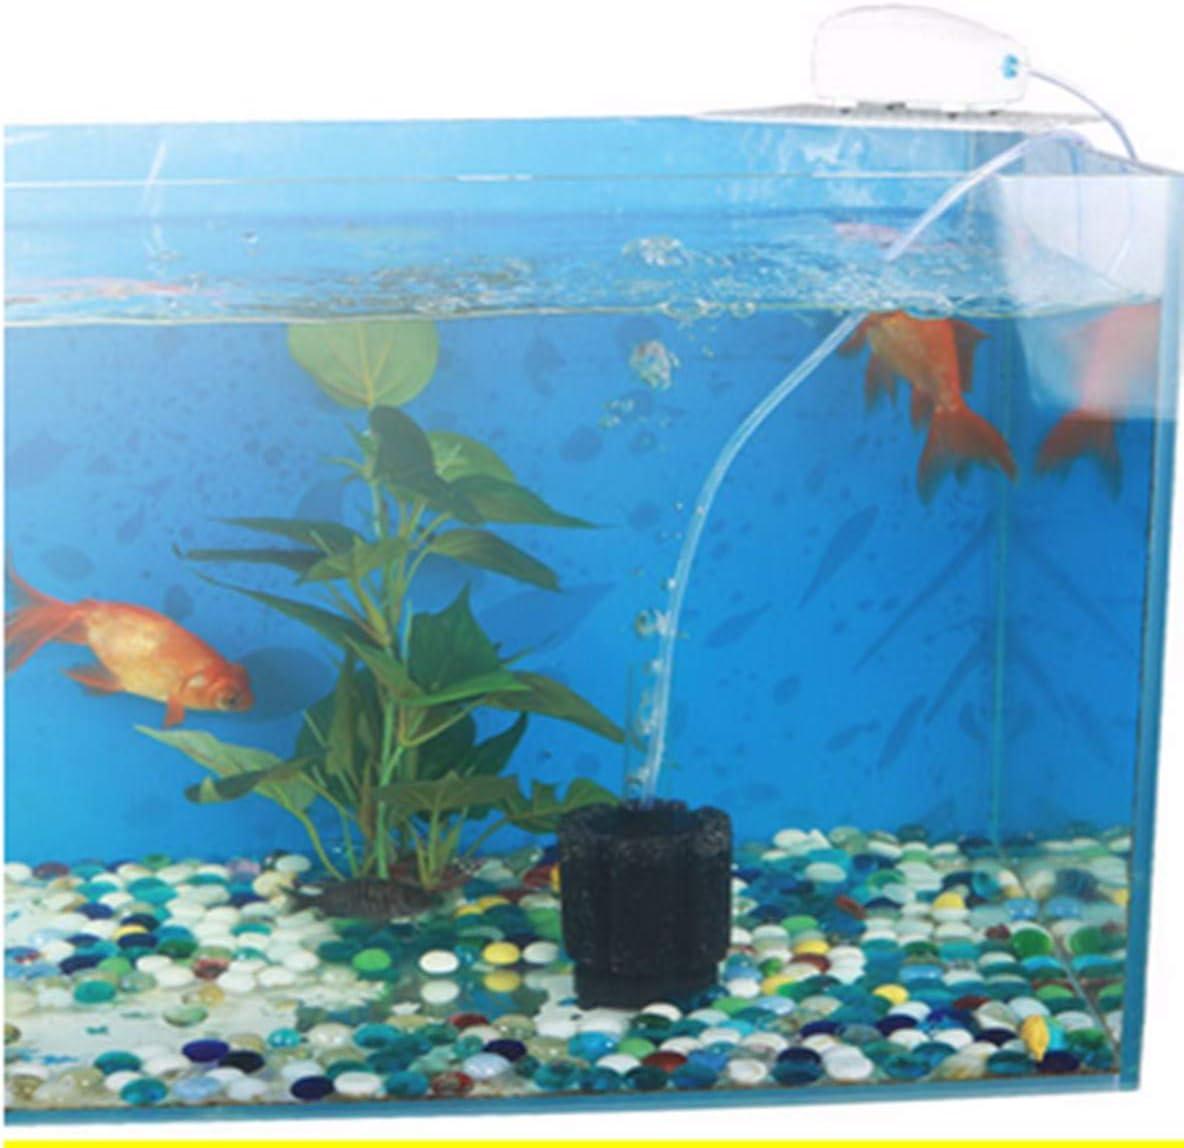 TZOU Aquarium Sponge Filter Cotton Fish Tank Shrimp Nano Pond Filtration